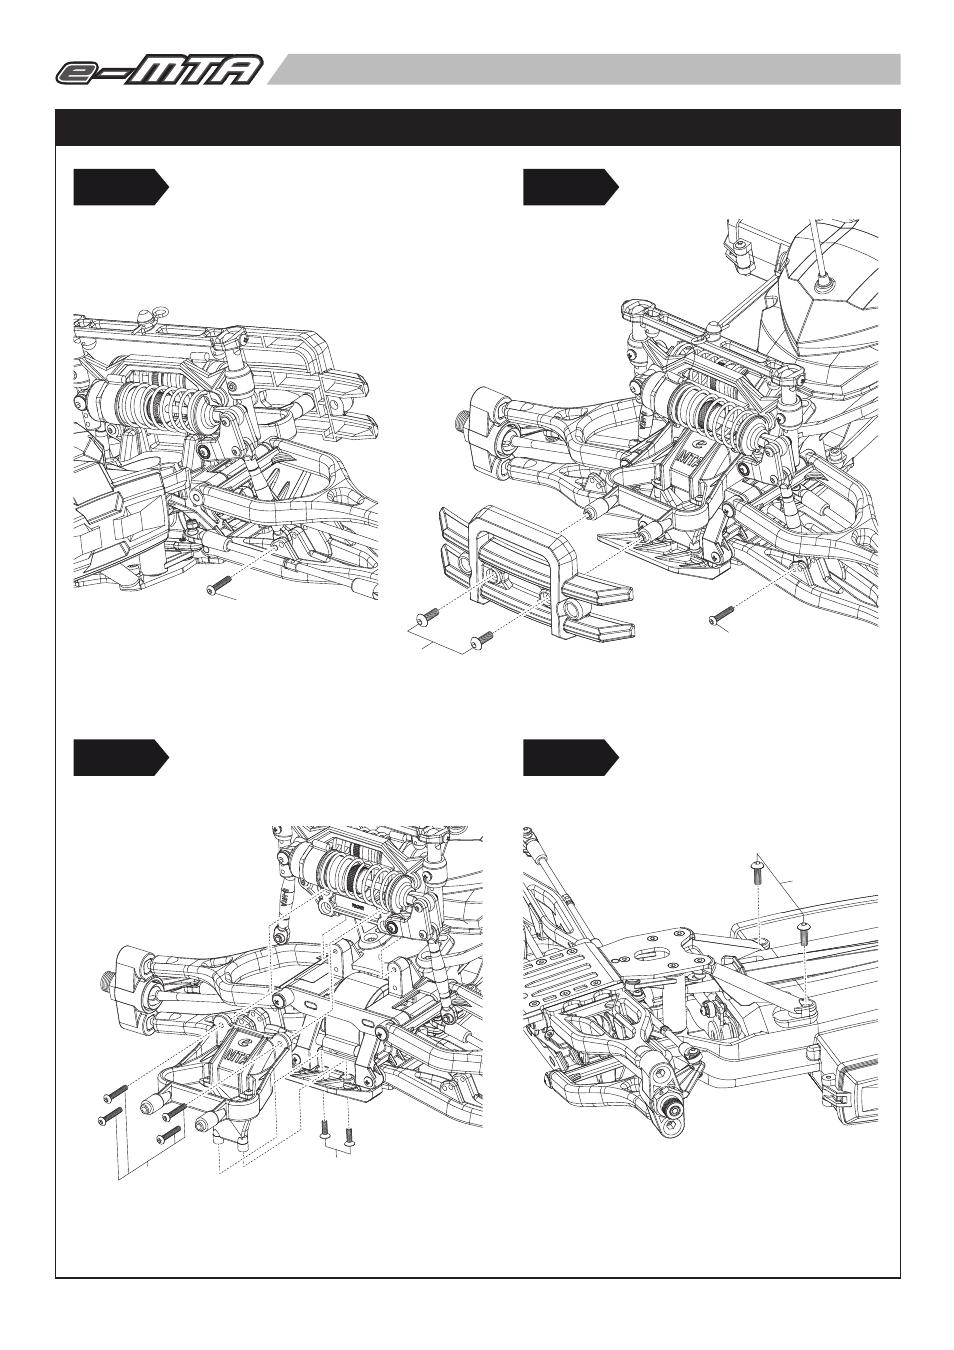 6403 p17.pdf, Front suspension maintenance, Step1 step3